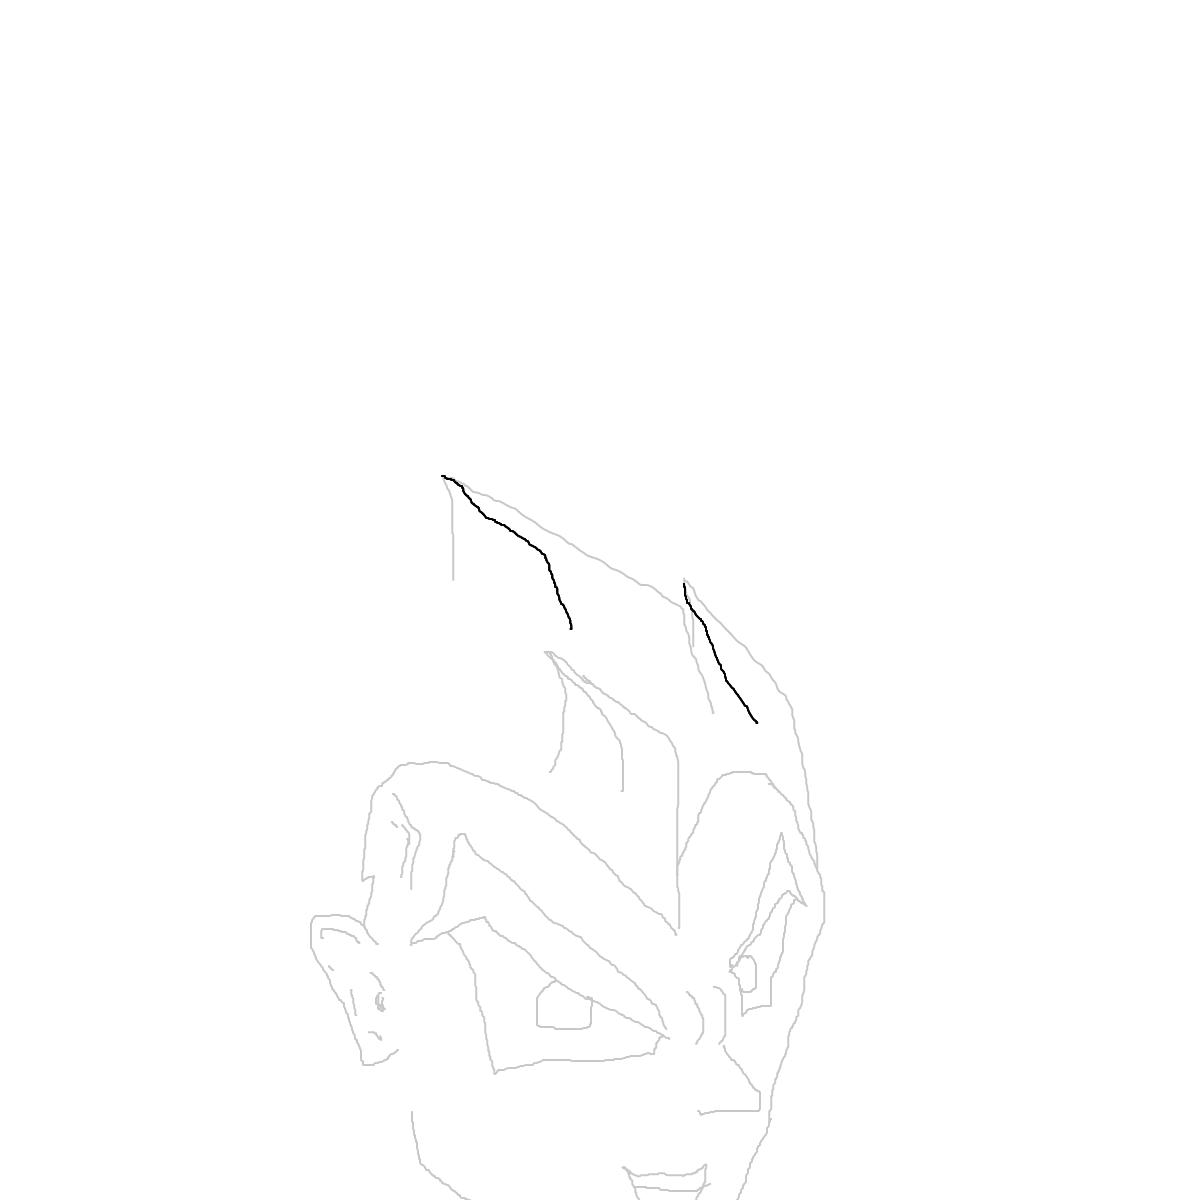 BAAAM drawing#5746 lat:35.6001739501953100lng: 139.4081268310547000